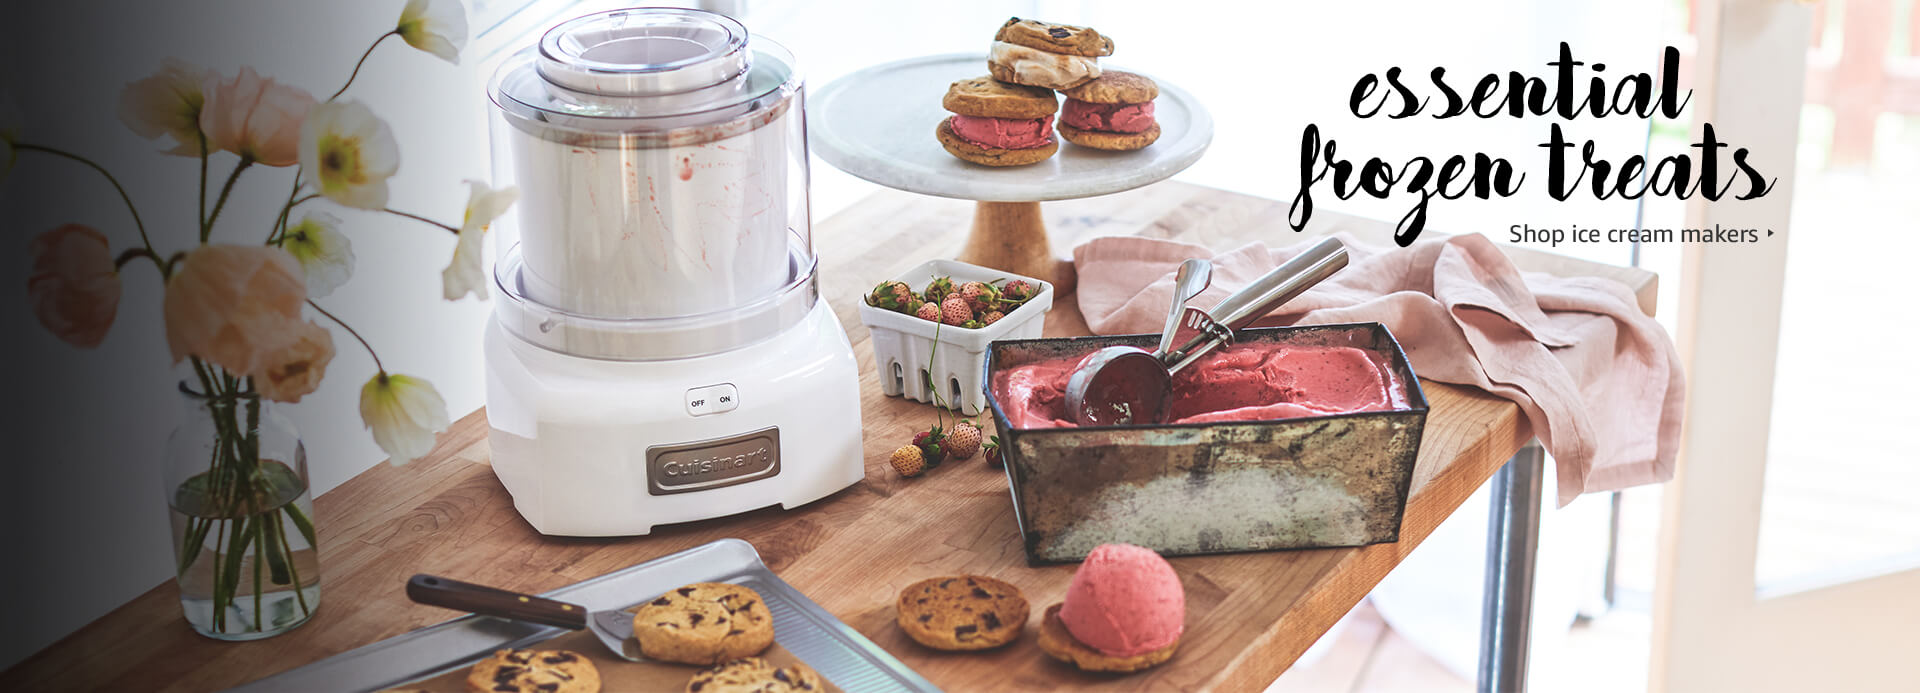 Kitchen small appliance essentials - Kitchen Appliances From Amazon Com